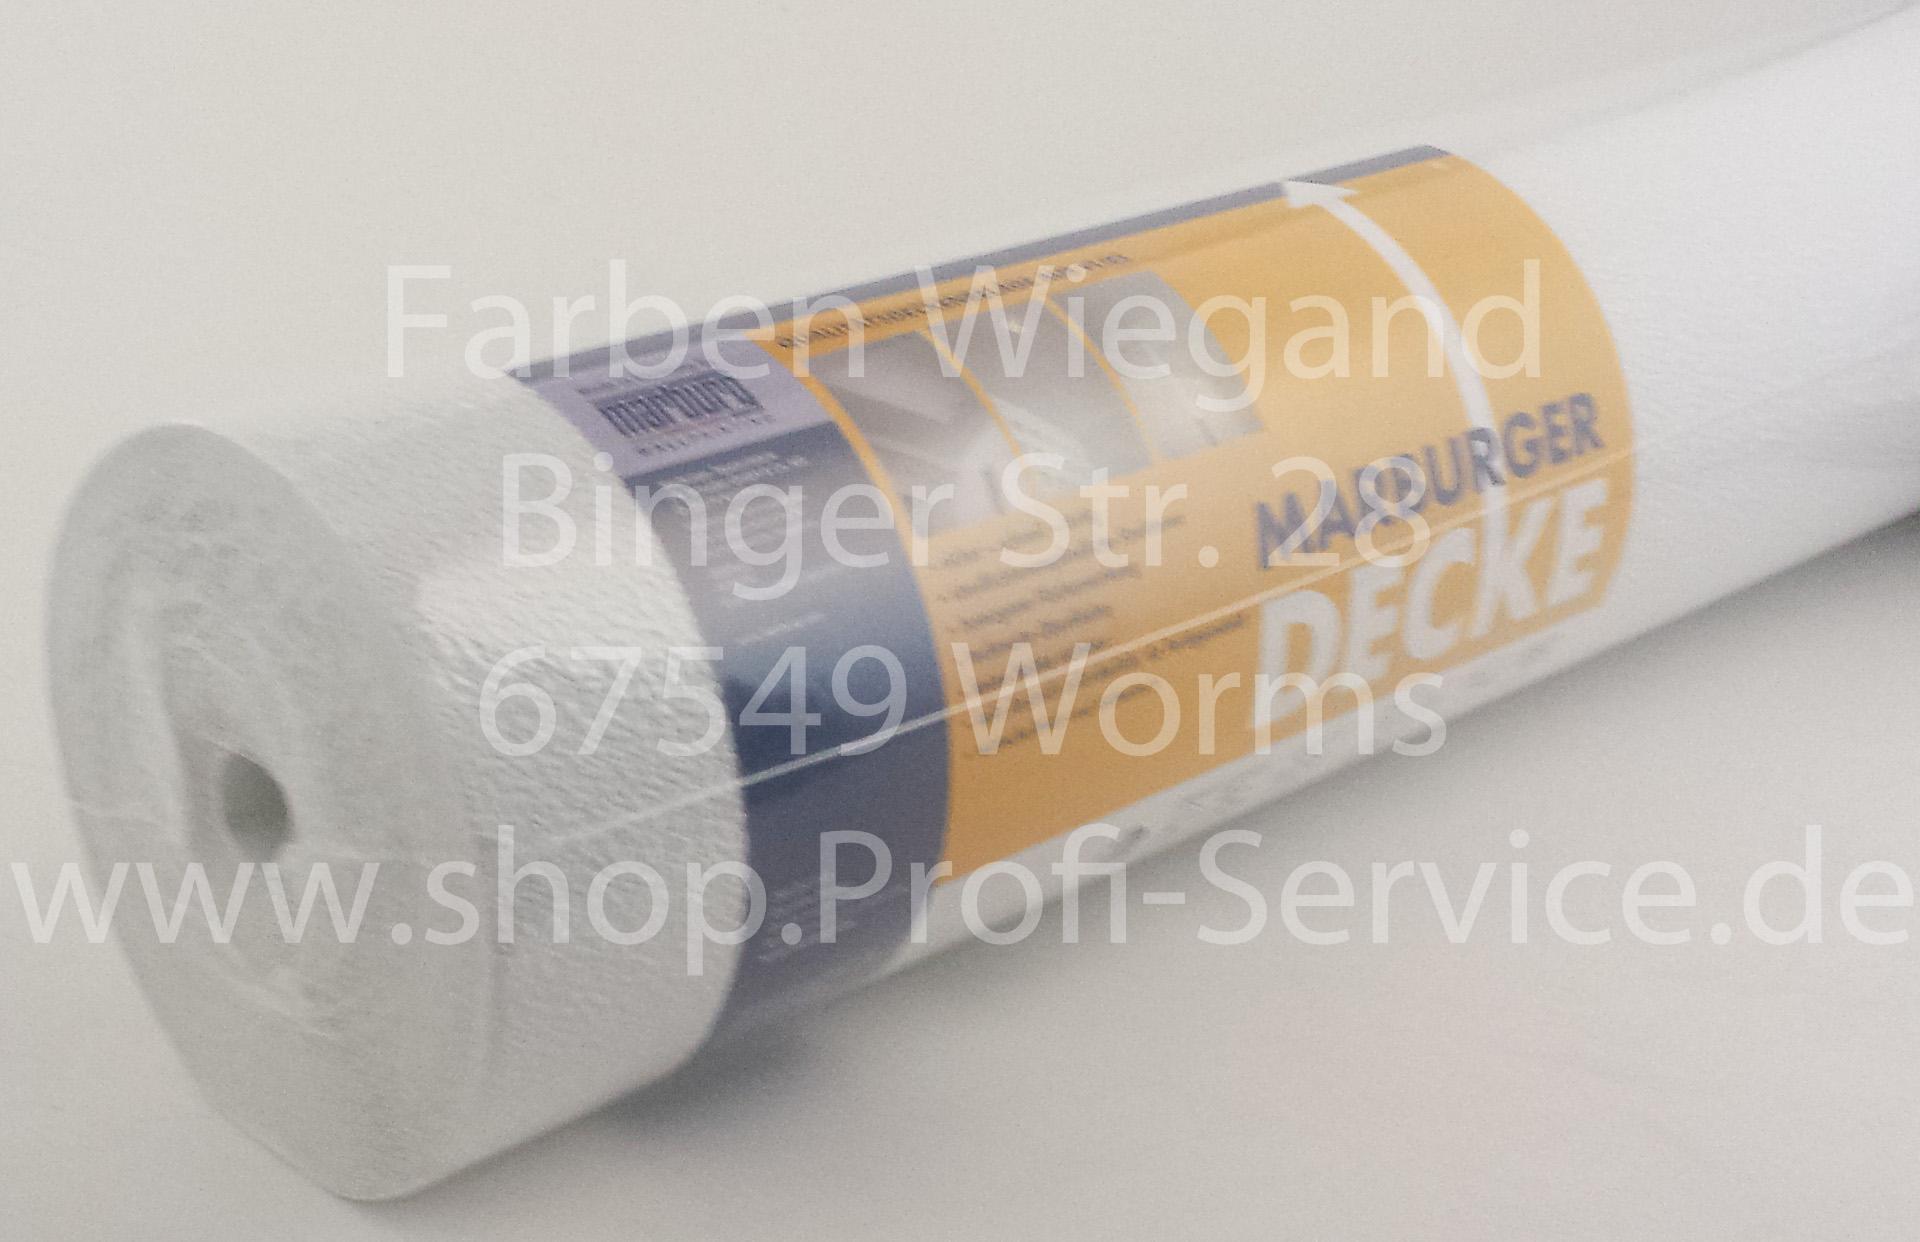 Top Marburger Decke 25 x 0,75 m | Farben Wiegand Onlineshop PN15